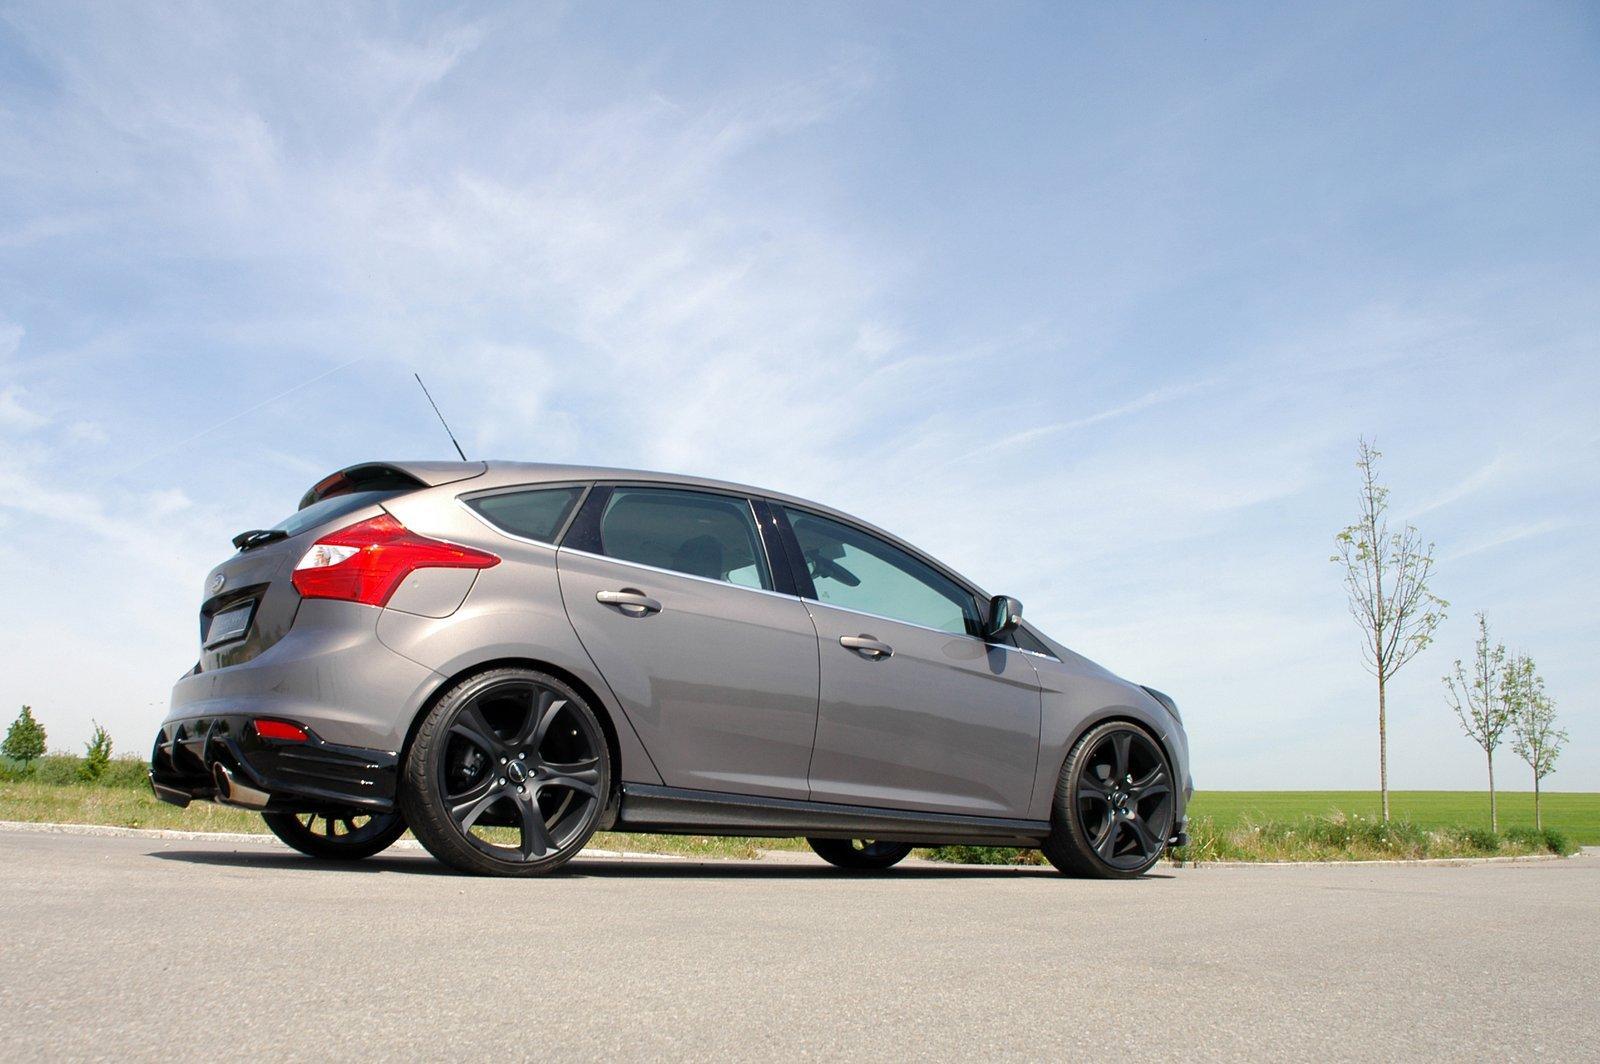 2011 Ford Focus Rims >> fotografia de Ford-focus-tuning-loder1899-9 - Tuning online